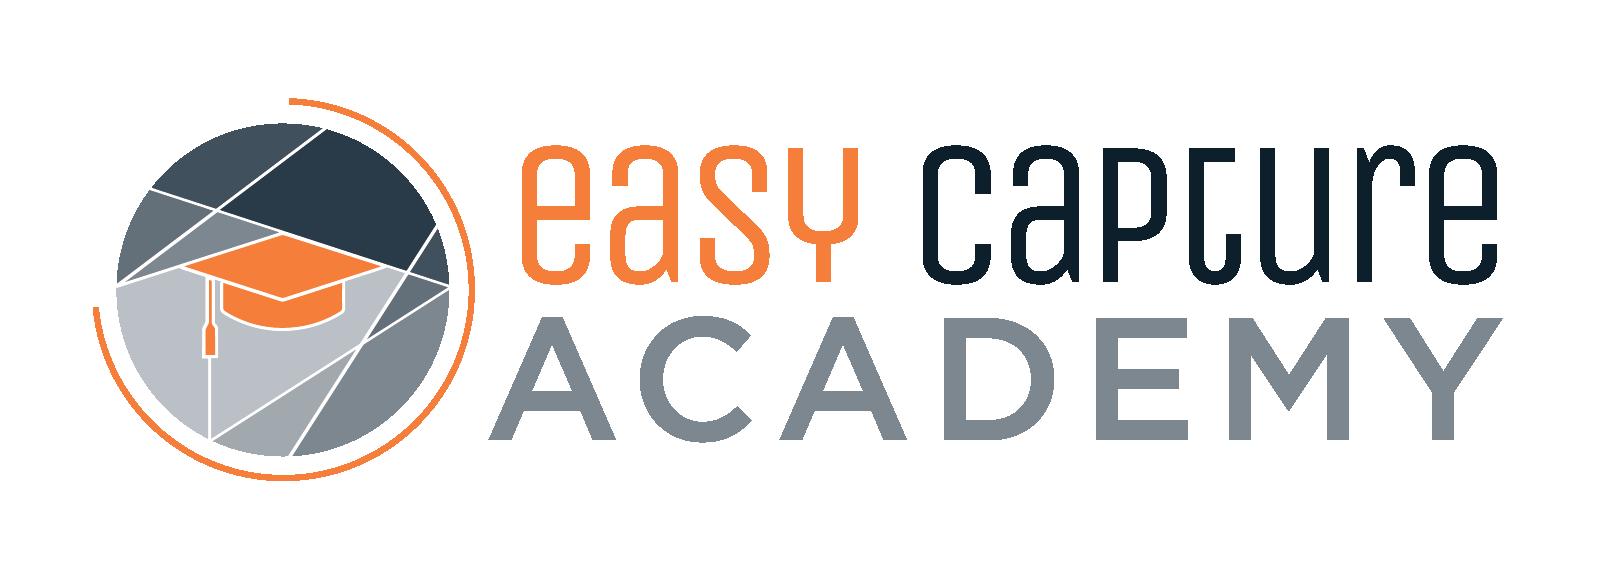 Easy Capture Academy Logo